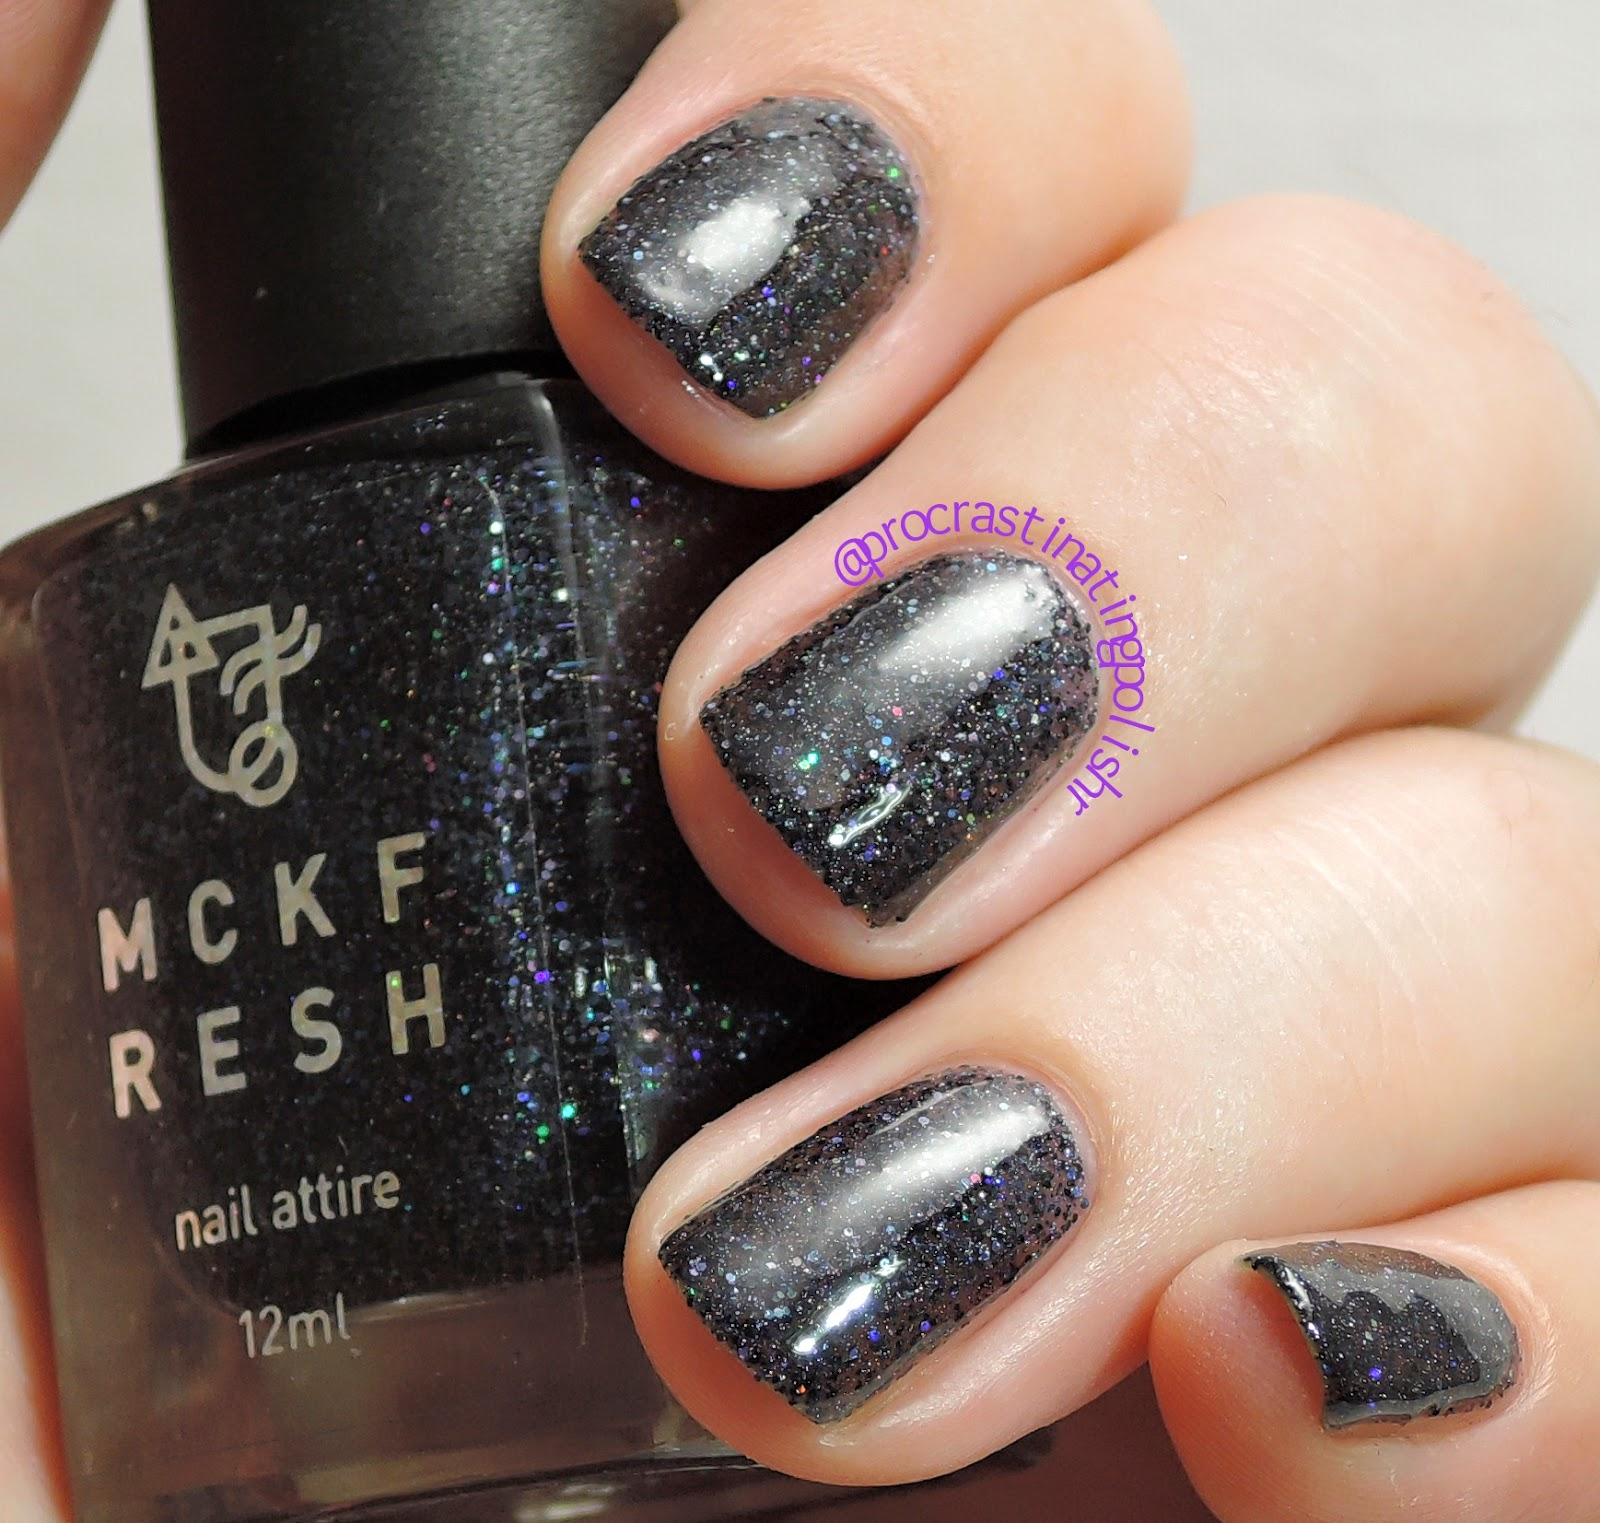 Mckfresh Nail Attire - Black Star Sapphire